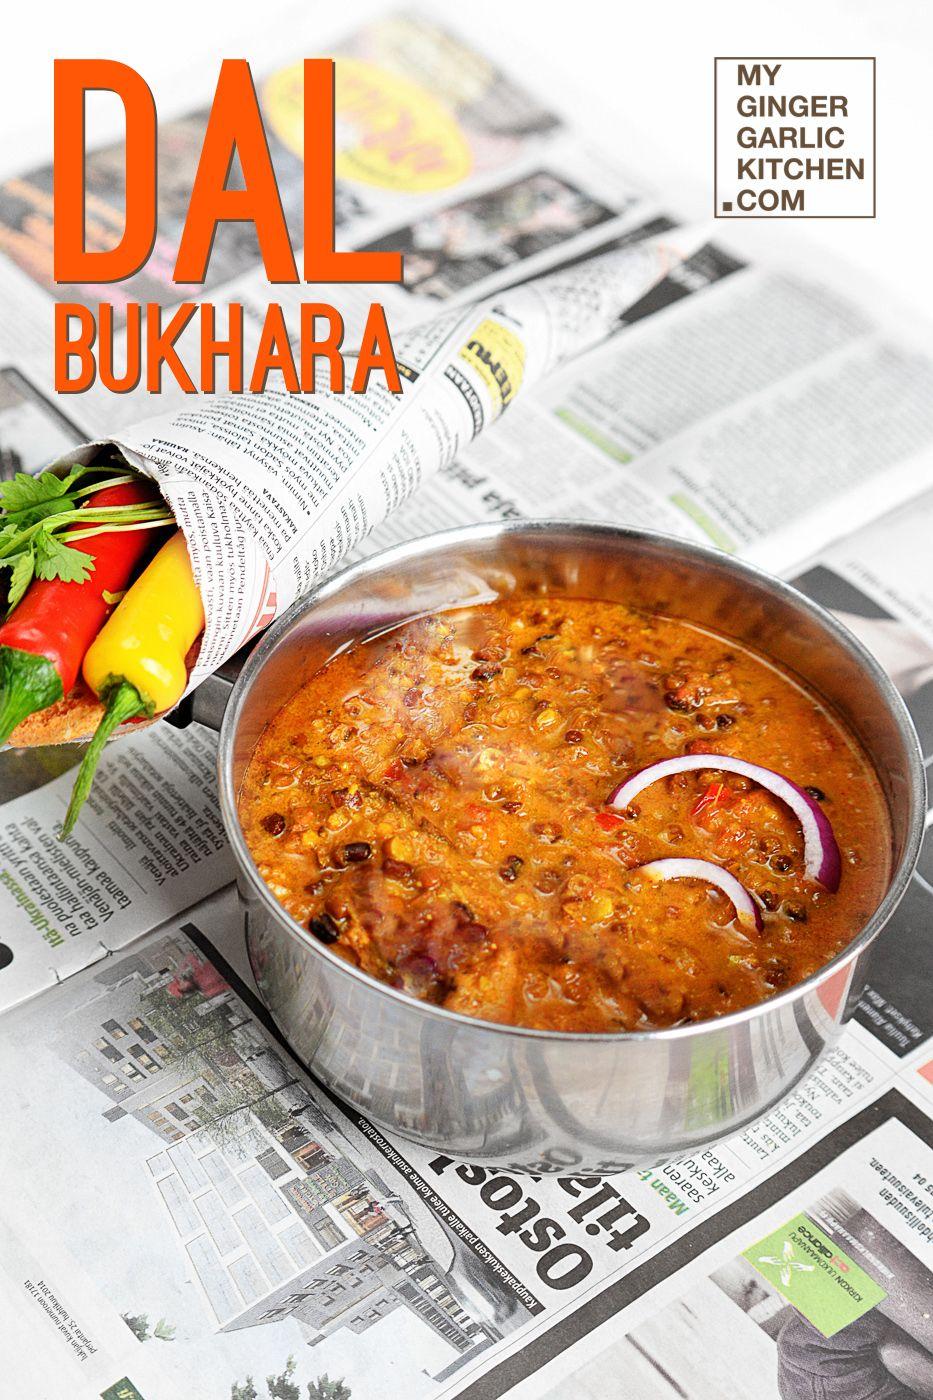 RECIPE] DAL BUKHARA – AN EXOTIC CREAMY BLACK LENTIL DISH | Food ...